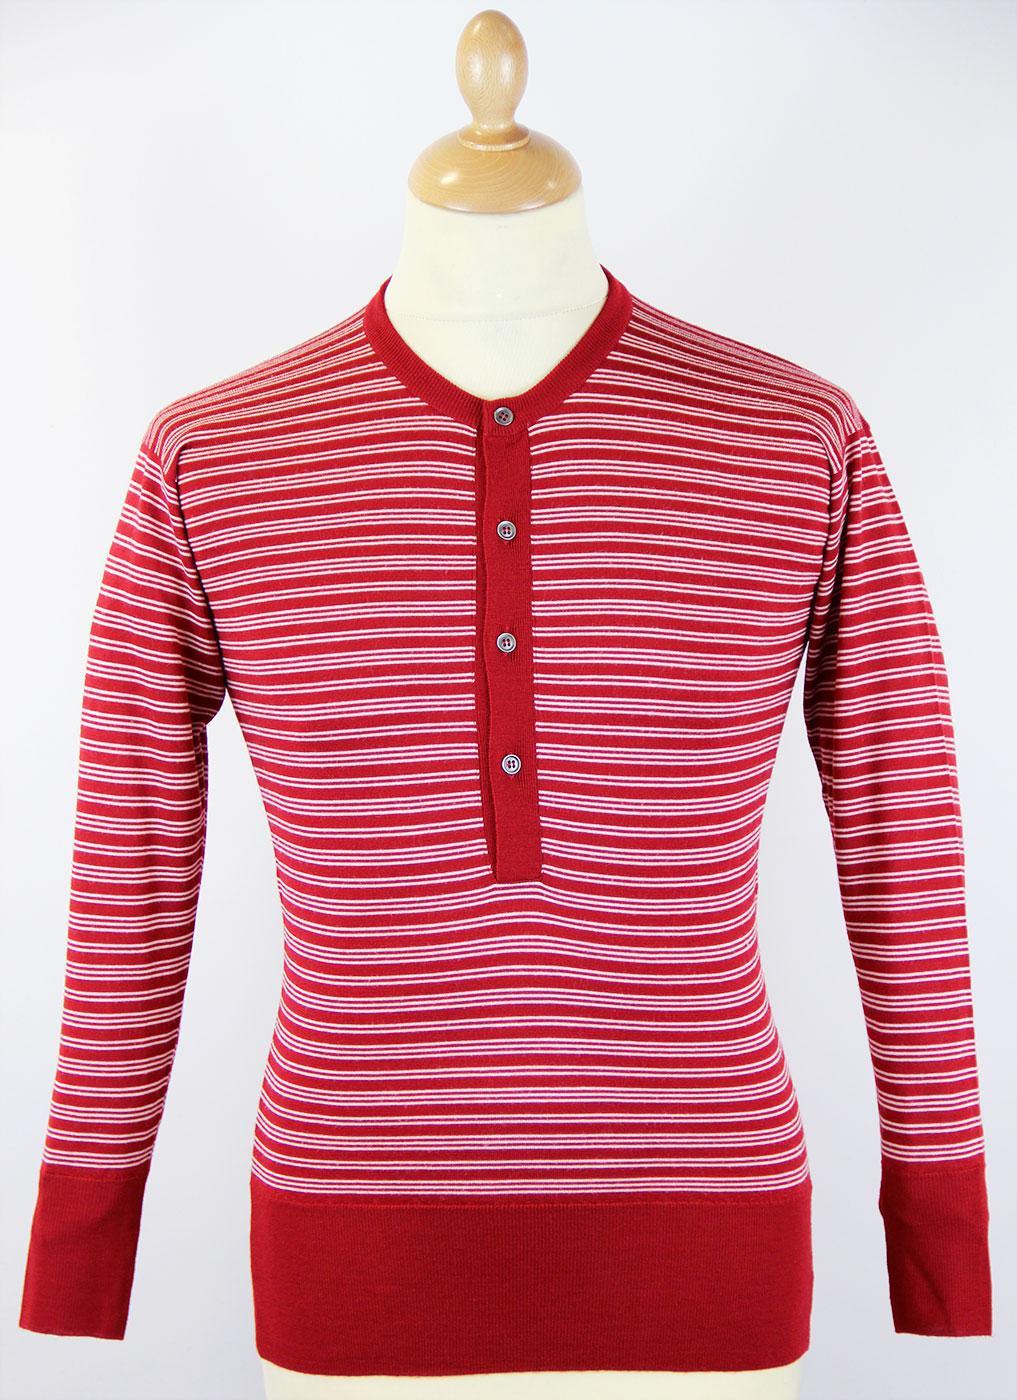 1011MSIG JOHN SMEDLEY Retro Mod Stripe Grandad Top